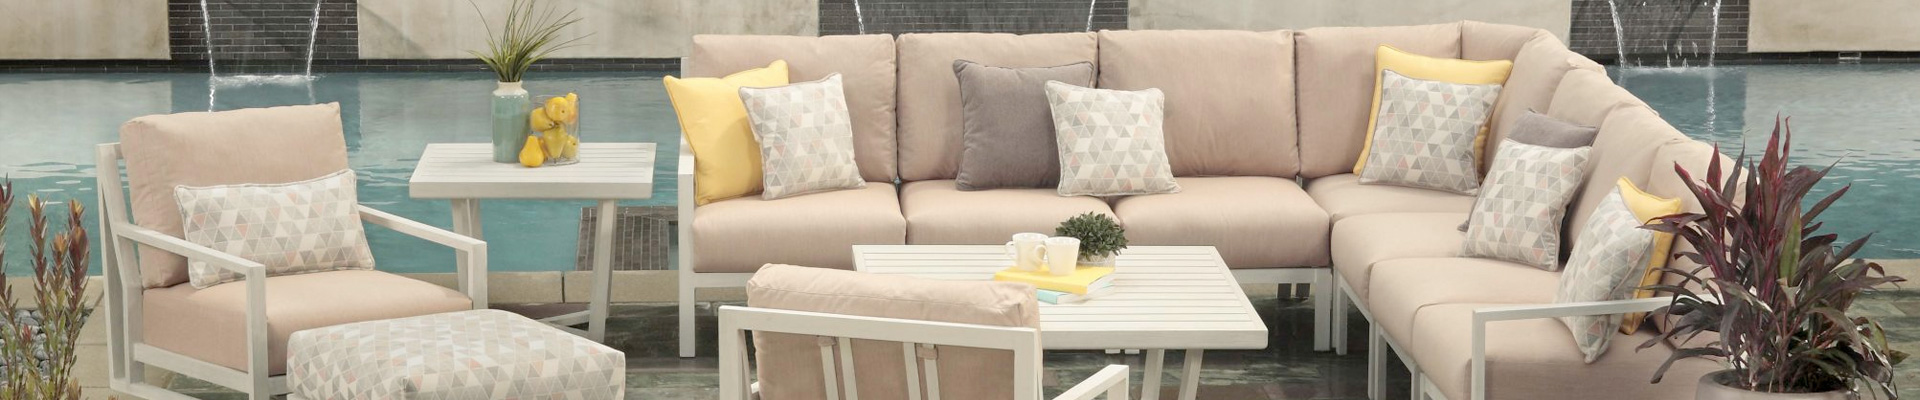 Mallin Casual Furniture